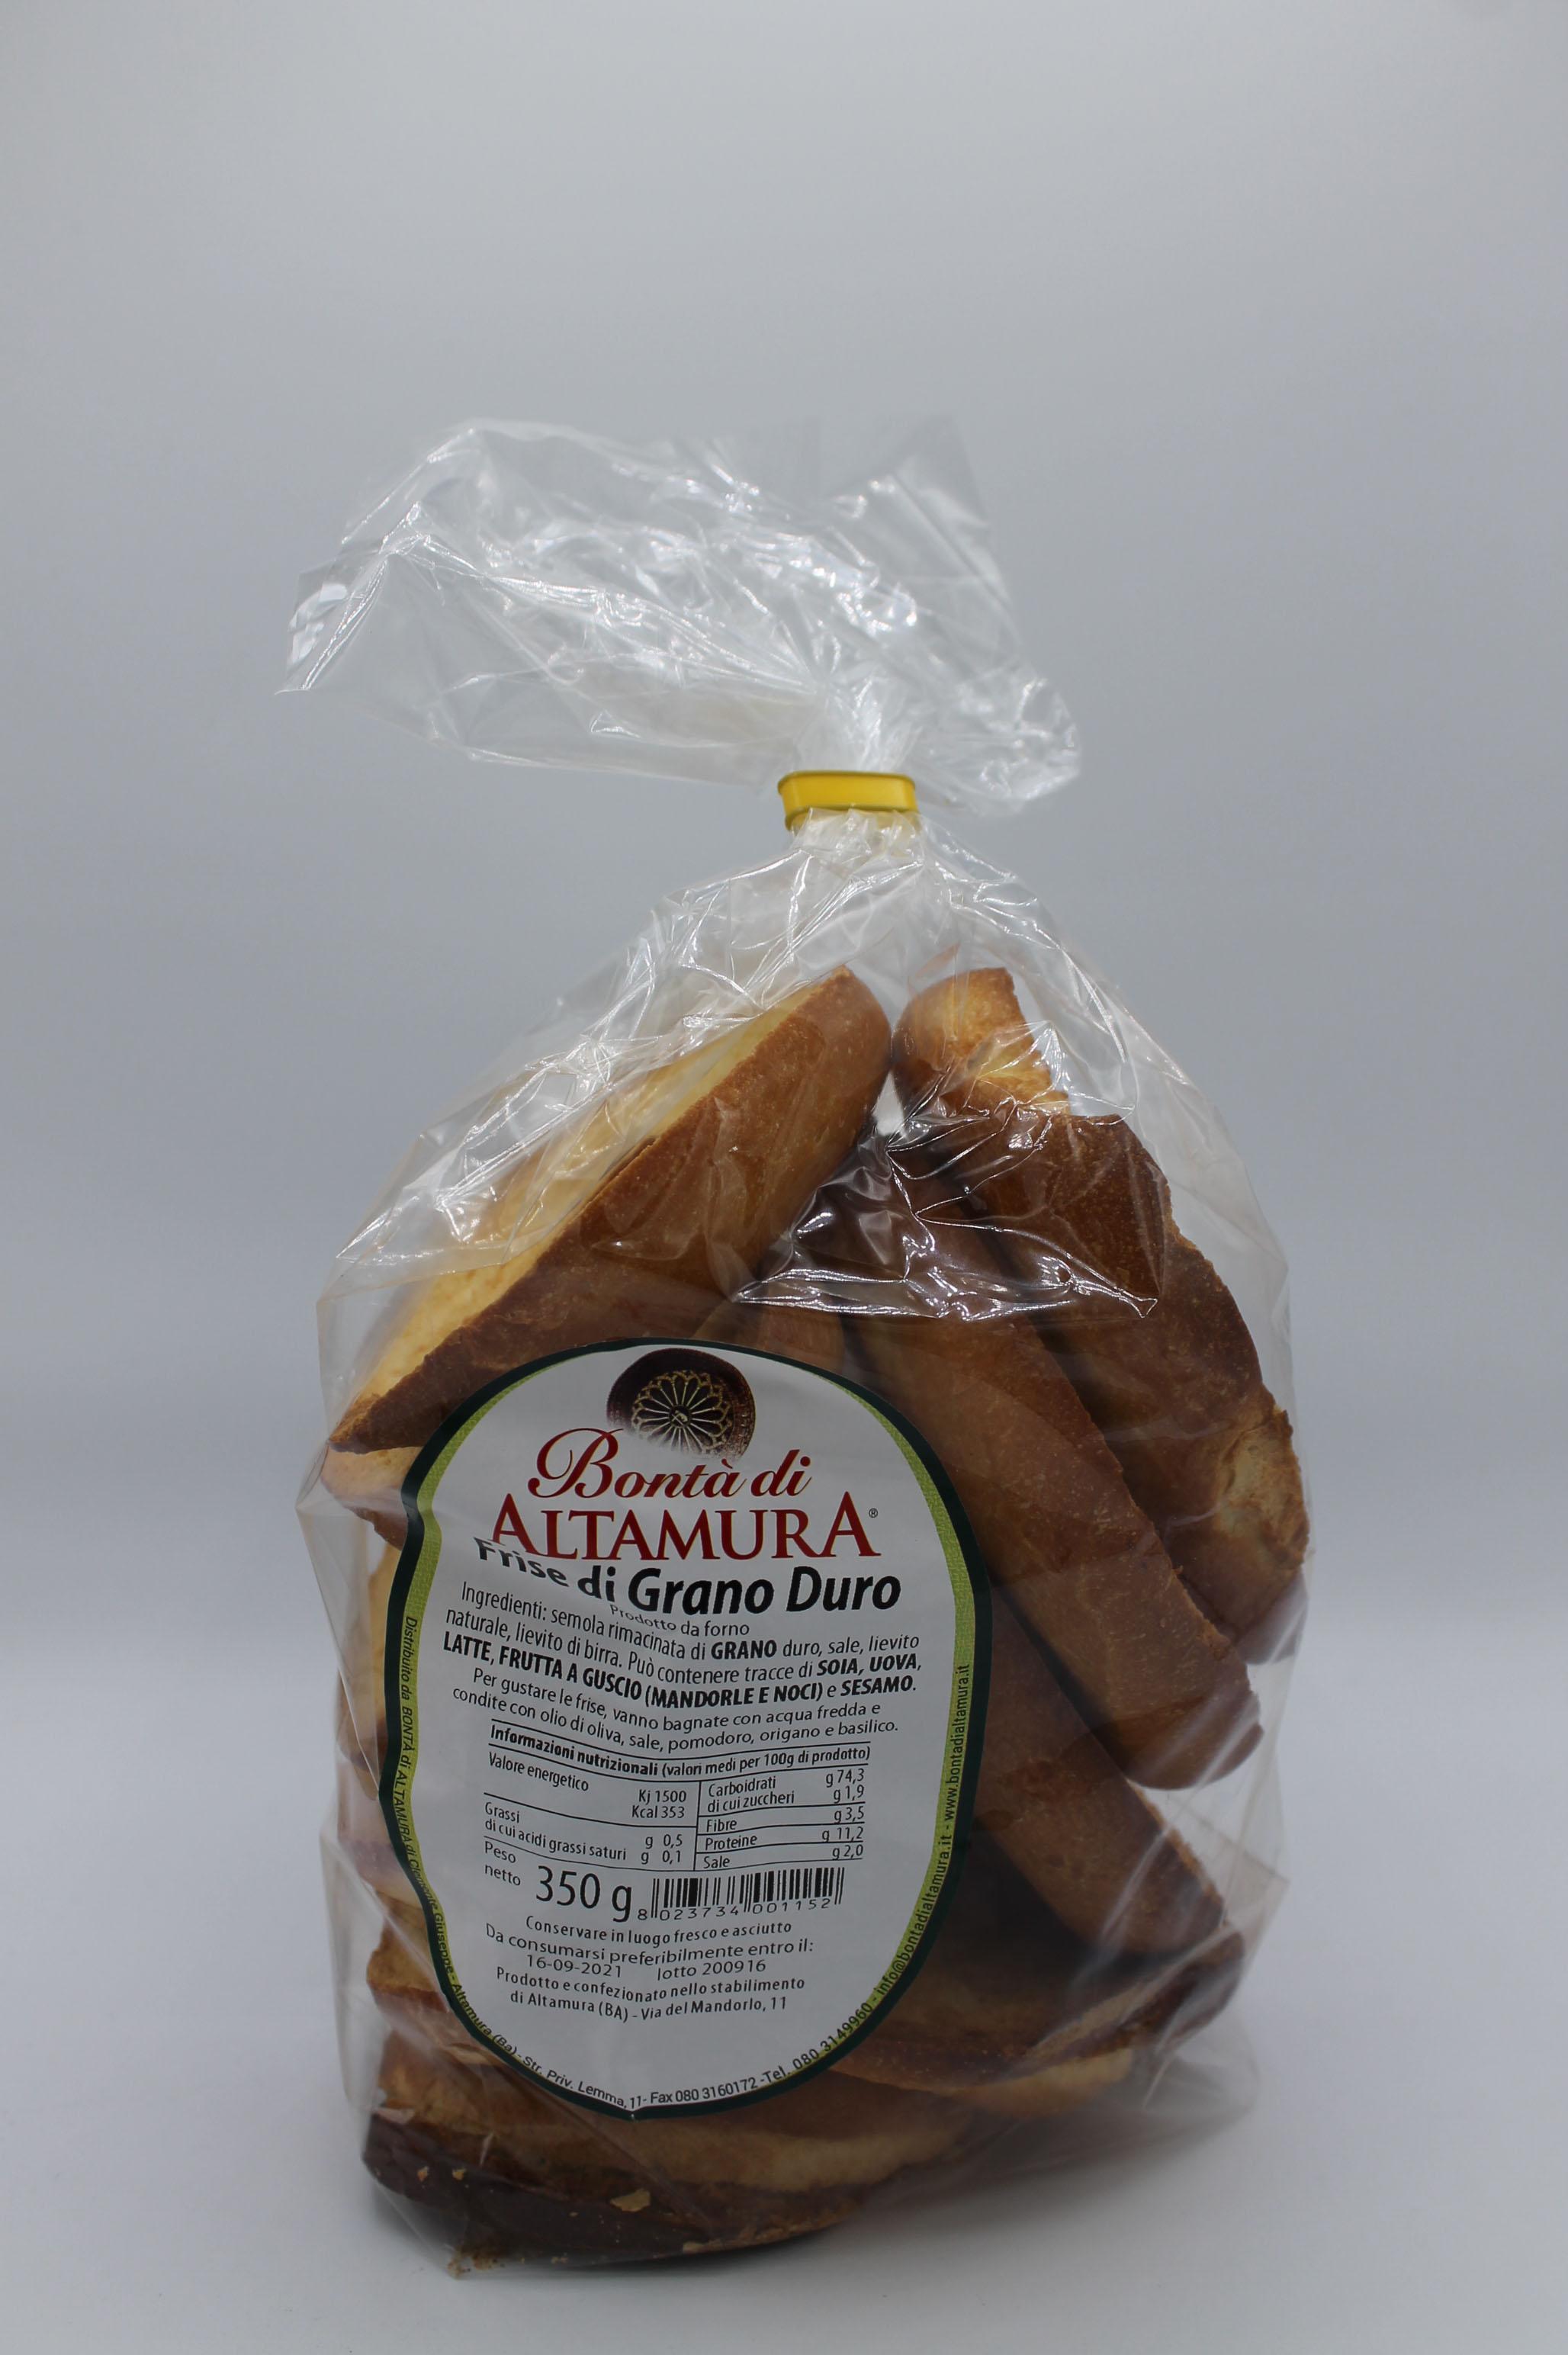 Bontà di Altamura frise grano duro 350 gr.